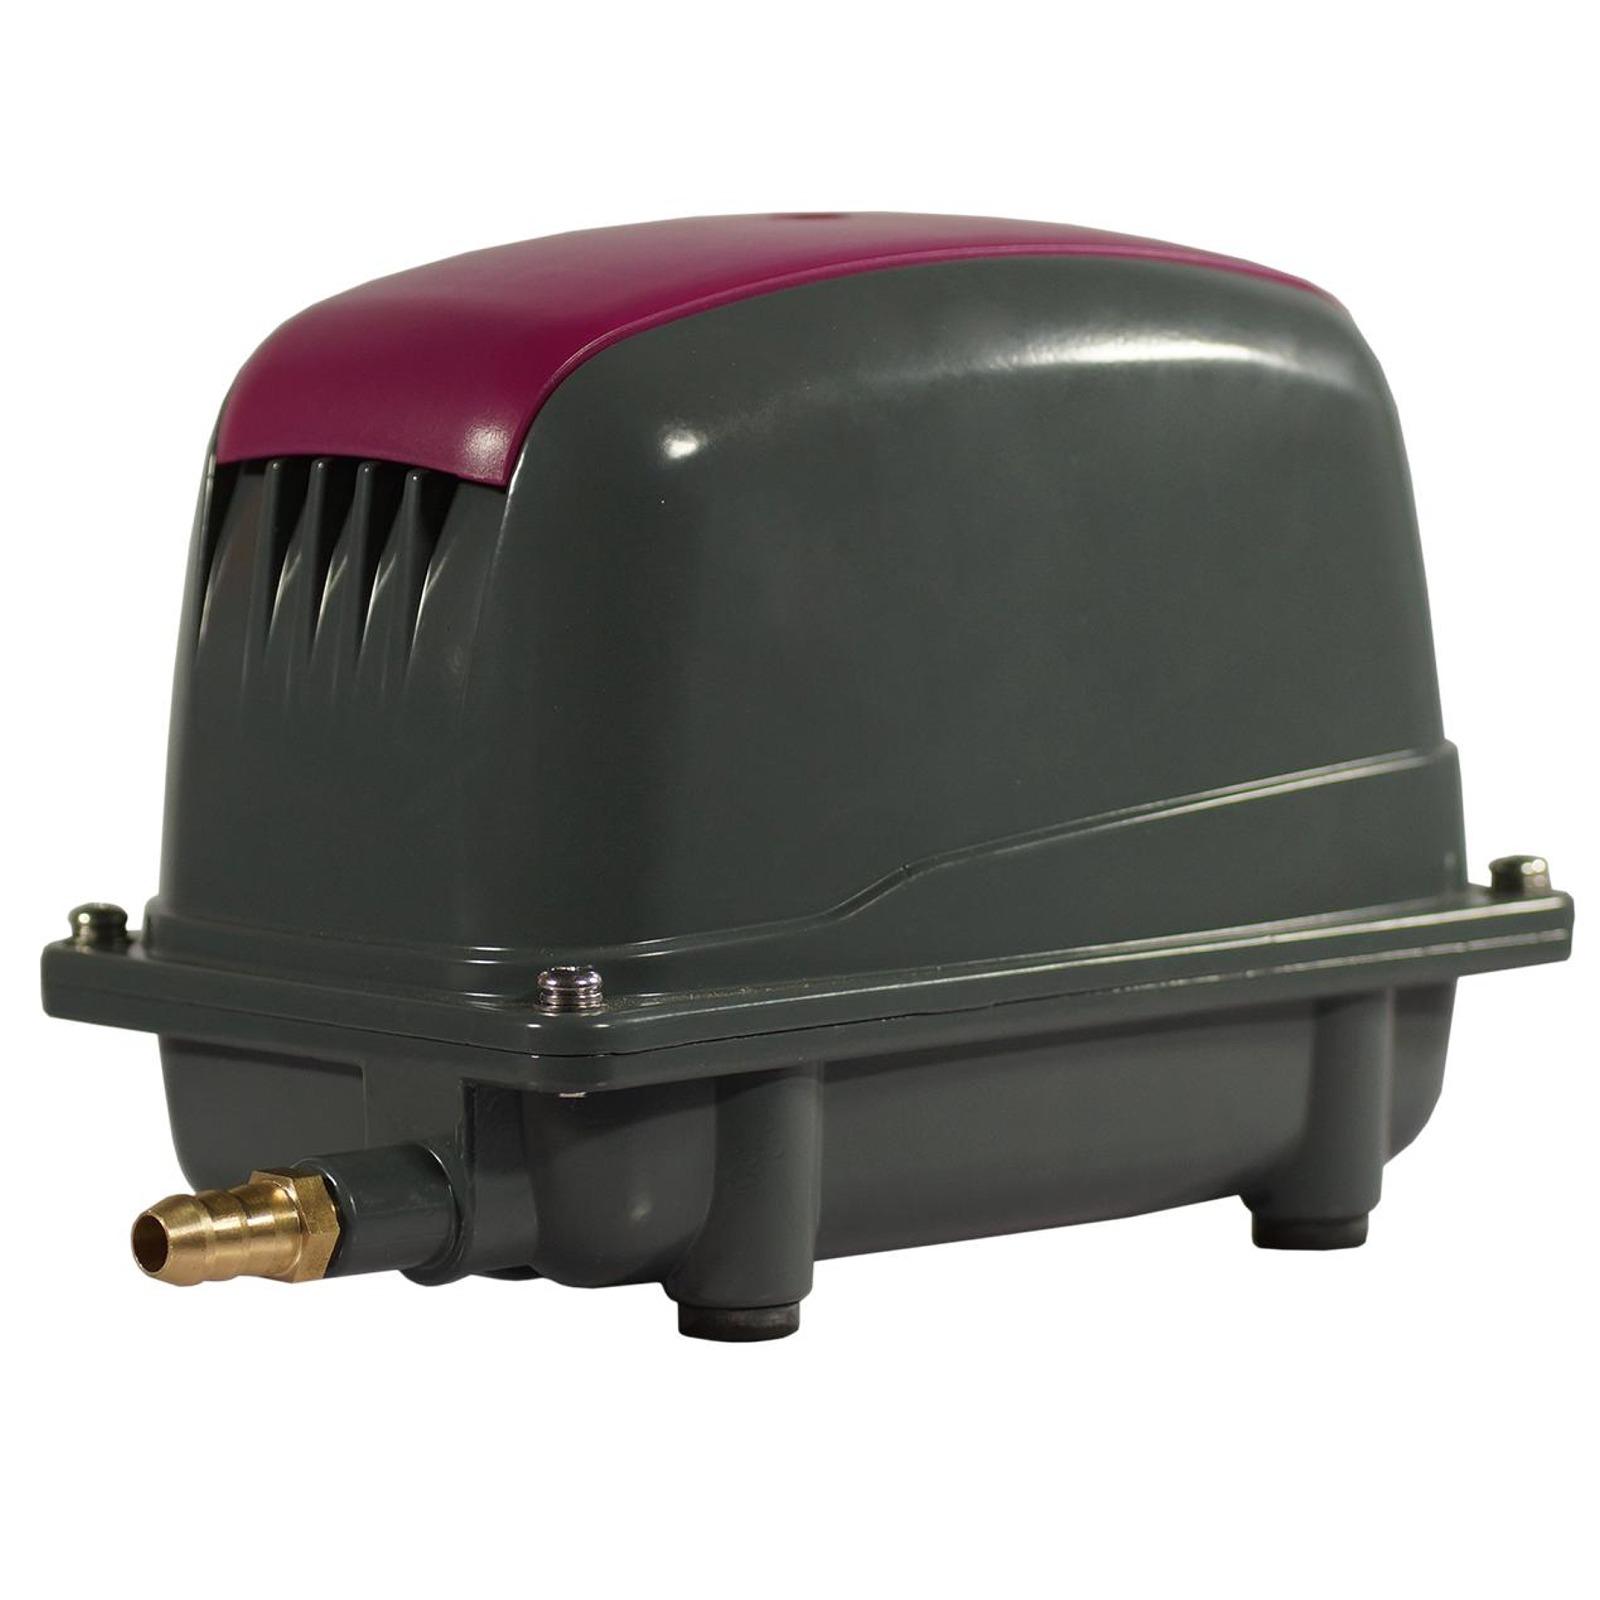 AQUA MEDIC Mistral 4000 V2 pompe à air 3900 L/h à membrane pour aquarium